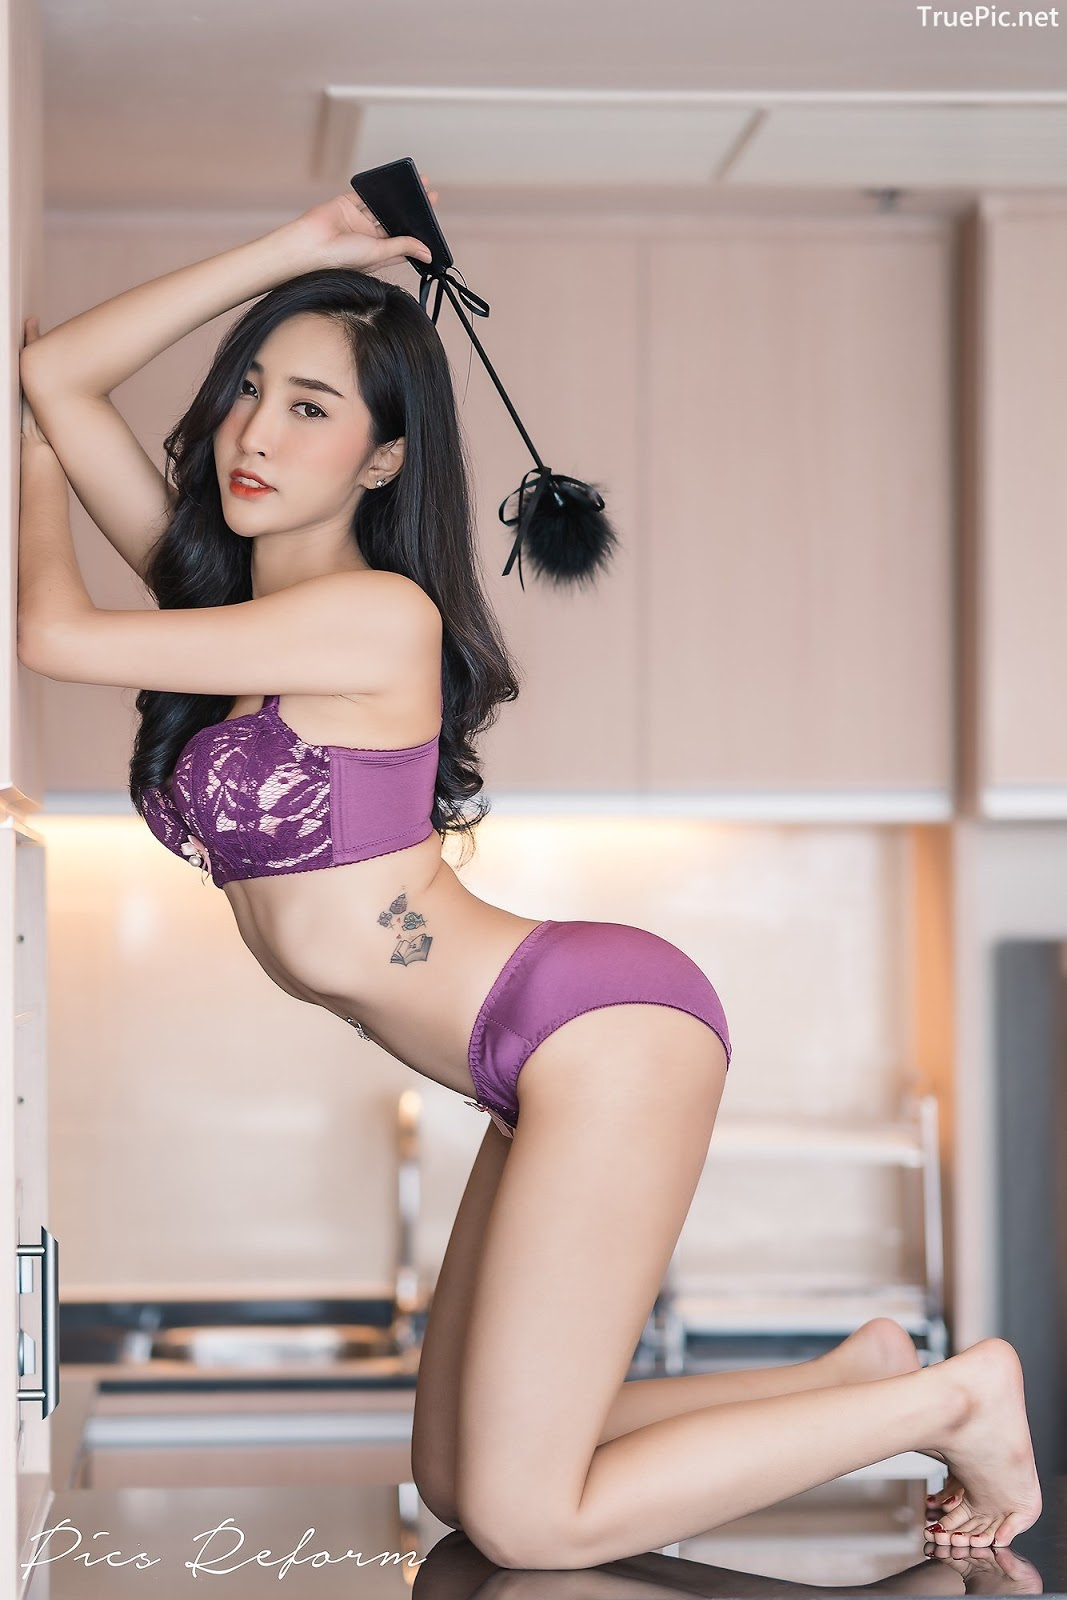 Image-Thailand-Sexy-Model-Yanapat-Ukkararujipat-Violet-Girl-TruePic.net- Picture-7